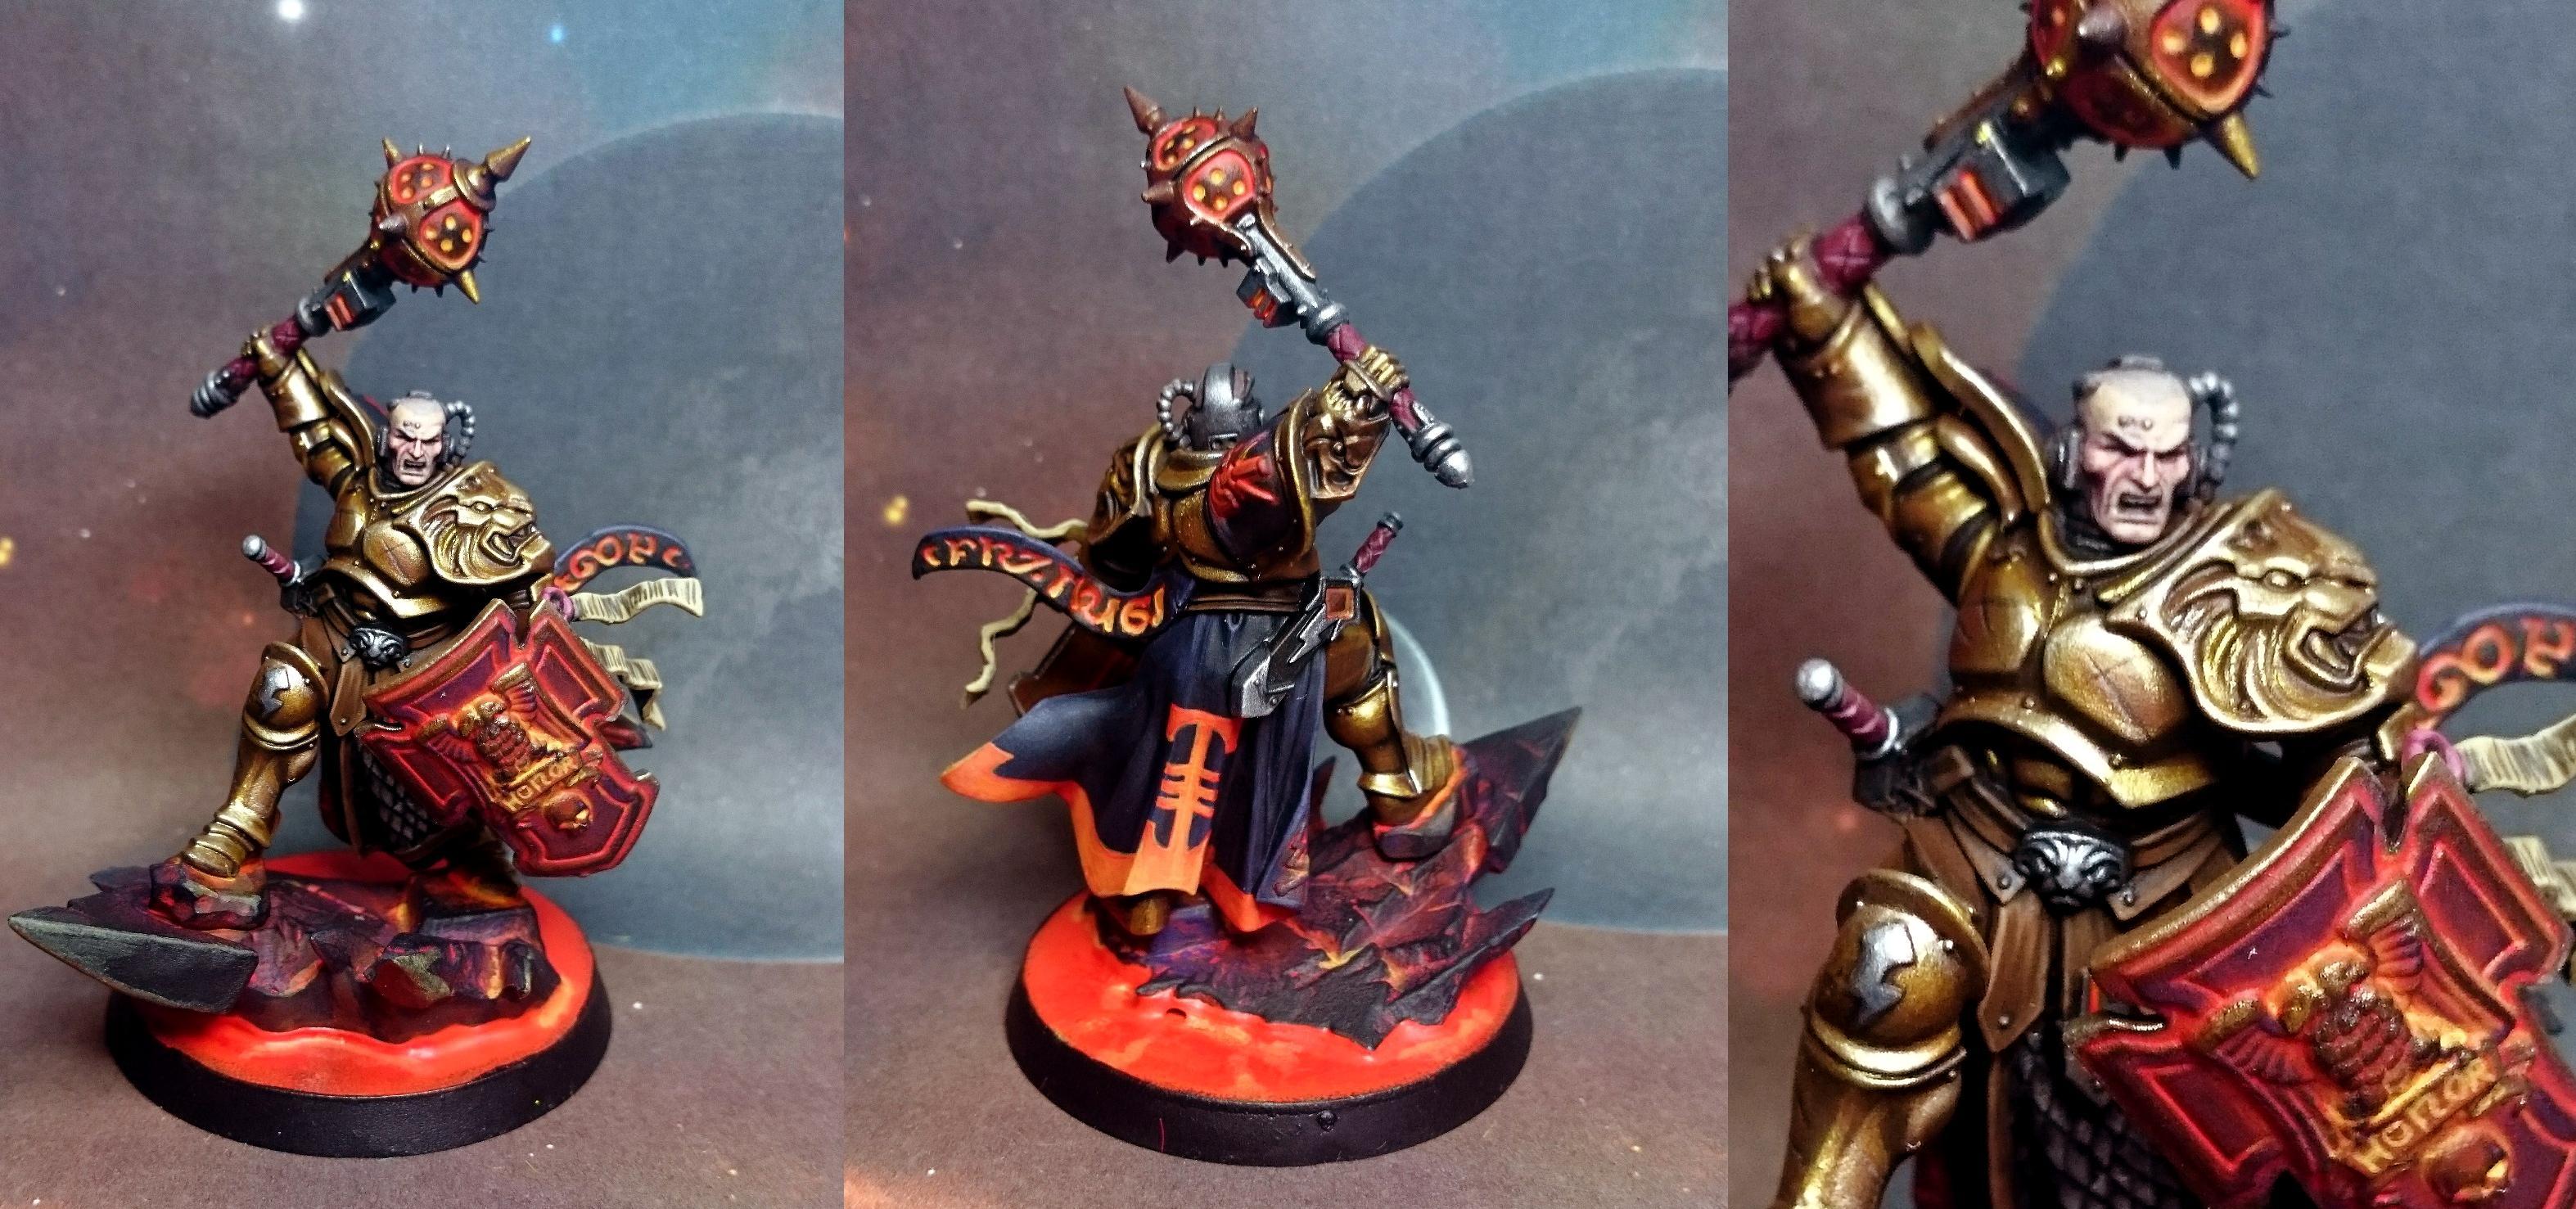 Inquisitor, Lava, Stormcast Eternals, Stormcast Eternals Conversion